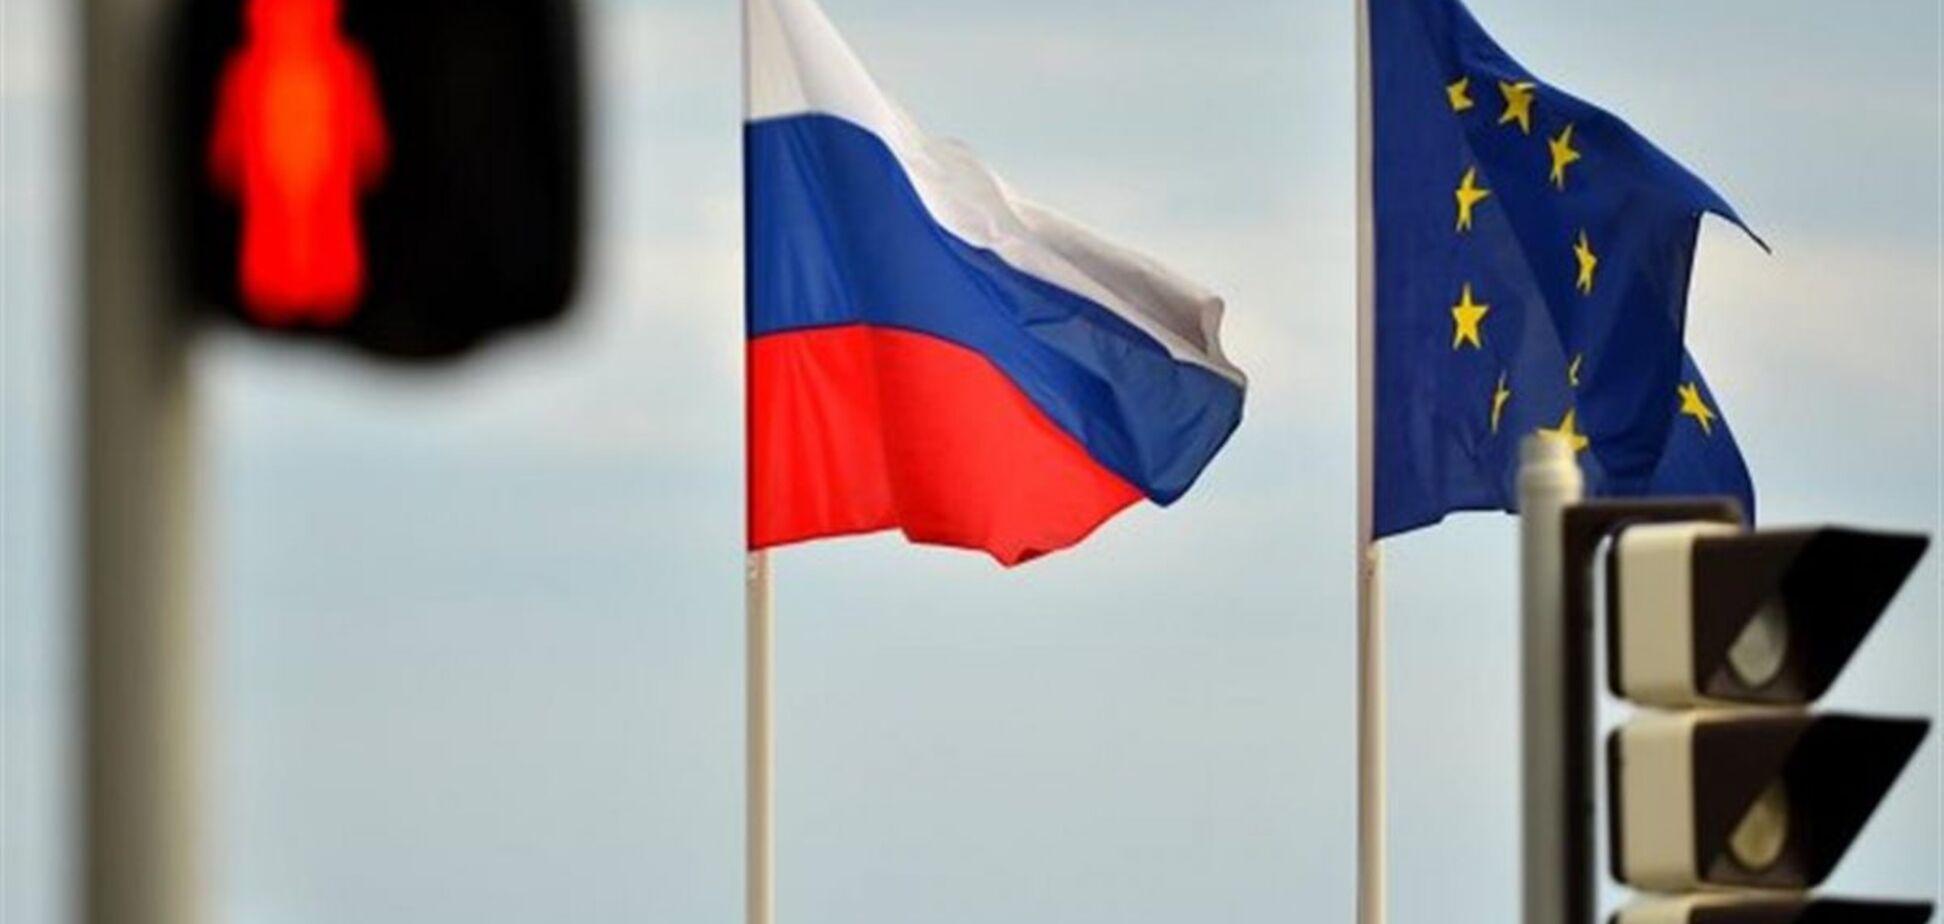 Совет ЕС единогласно продлил санкции против России